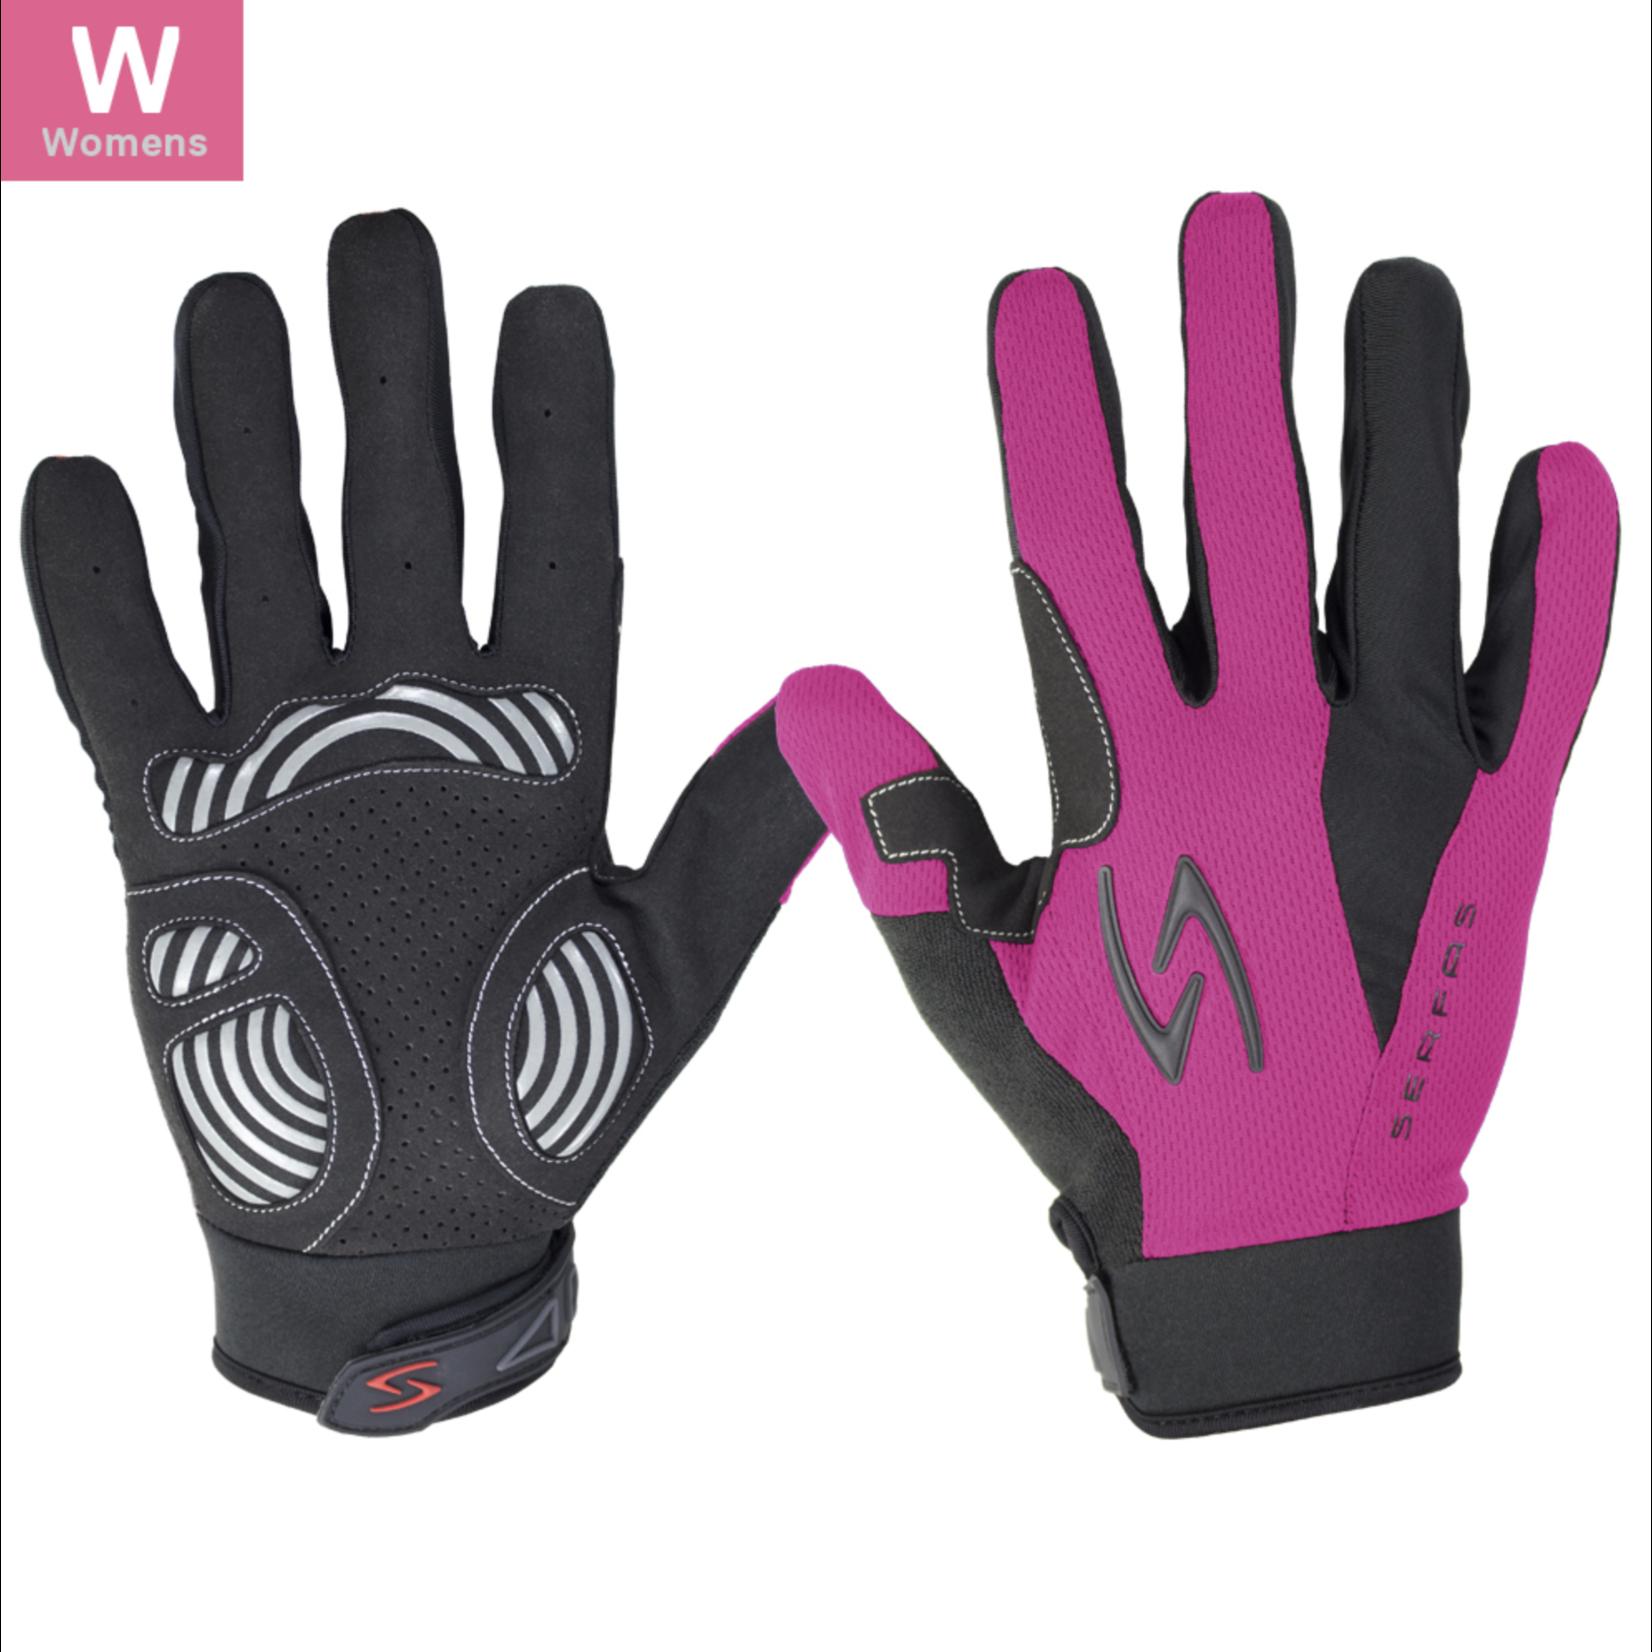 SERFAS Zen Long Finger Gloves ZLW-PK-2 Pink Womens LG (SERFAS)